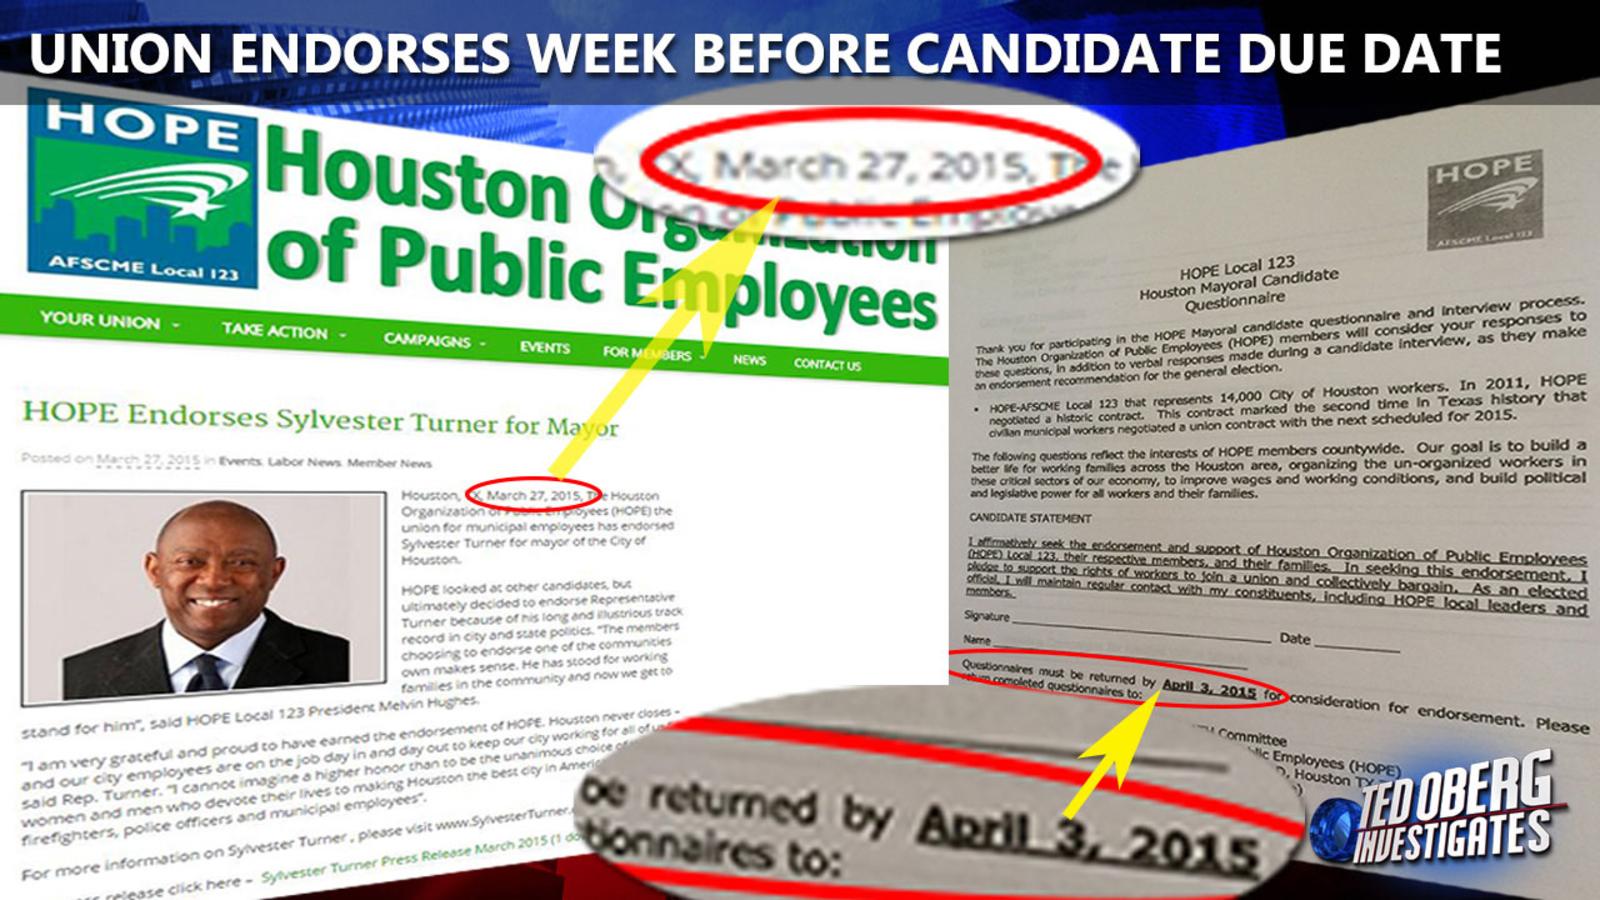 Timing of Houston public employee union endorsement